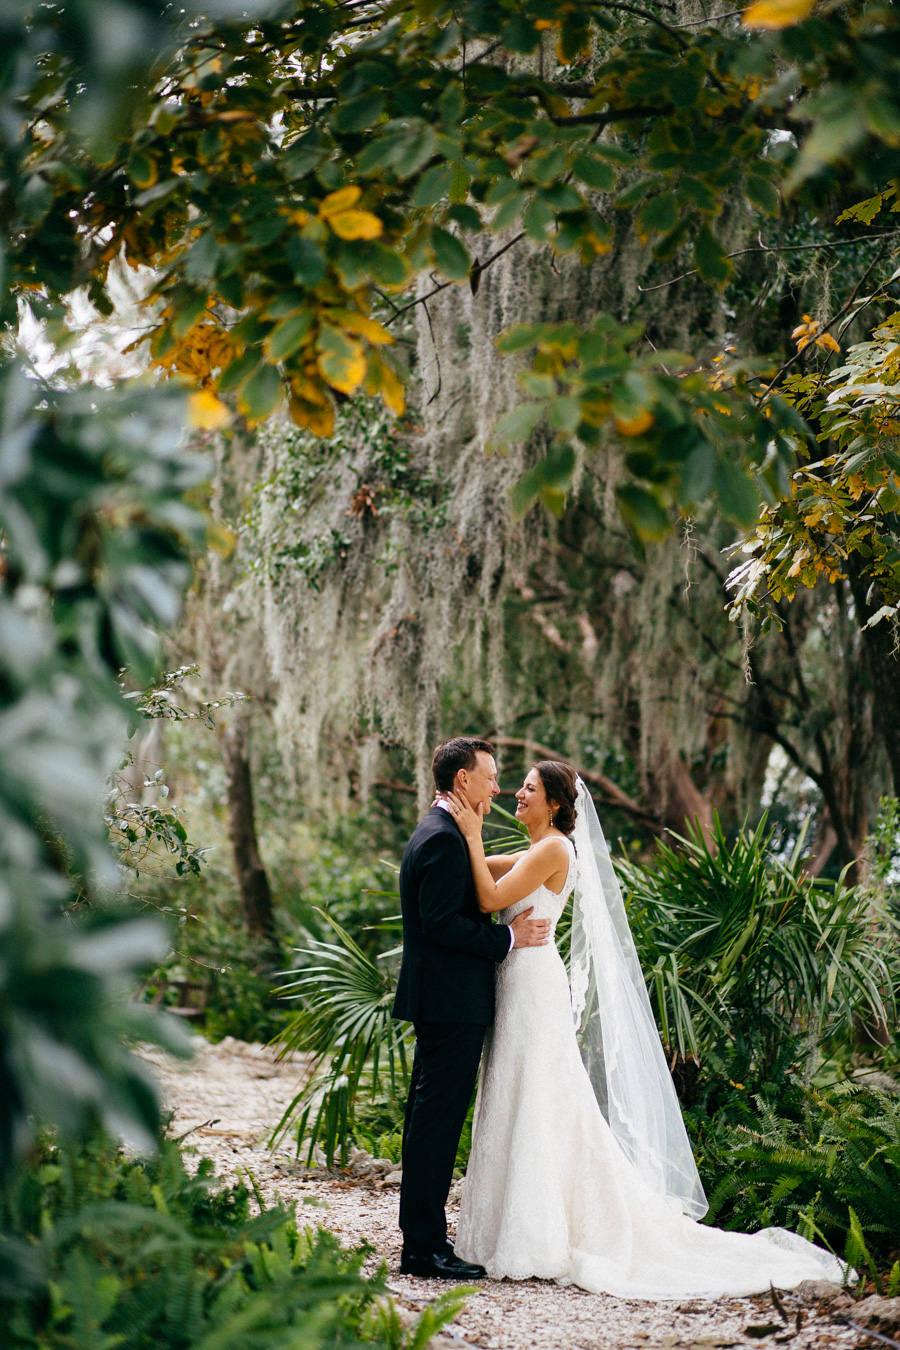 Outdoor, Bride and Groom Wedding Portrait at Sarasota Wedding Venue Marie Selby Gardens